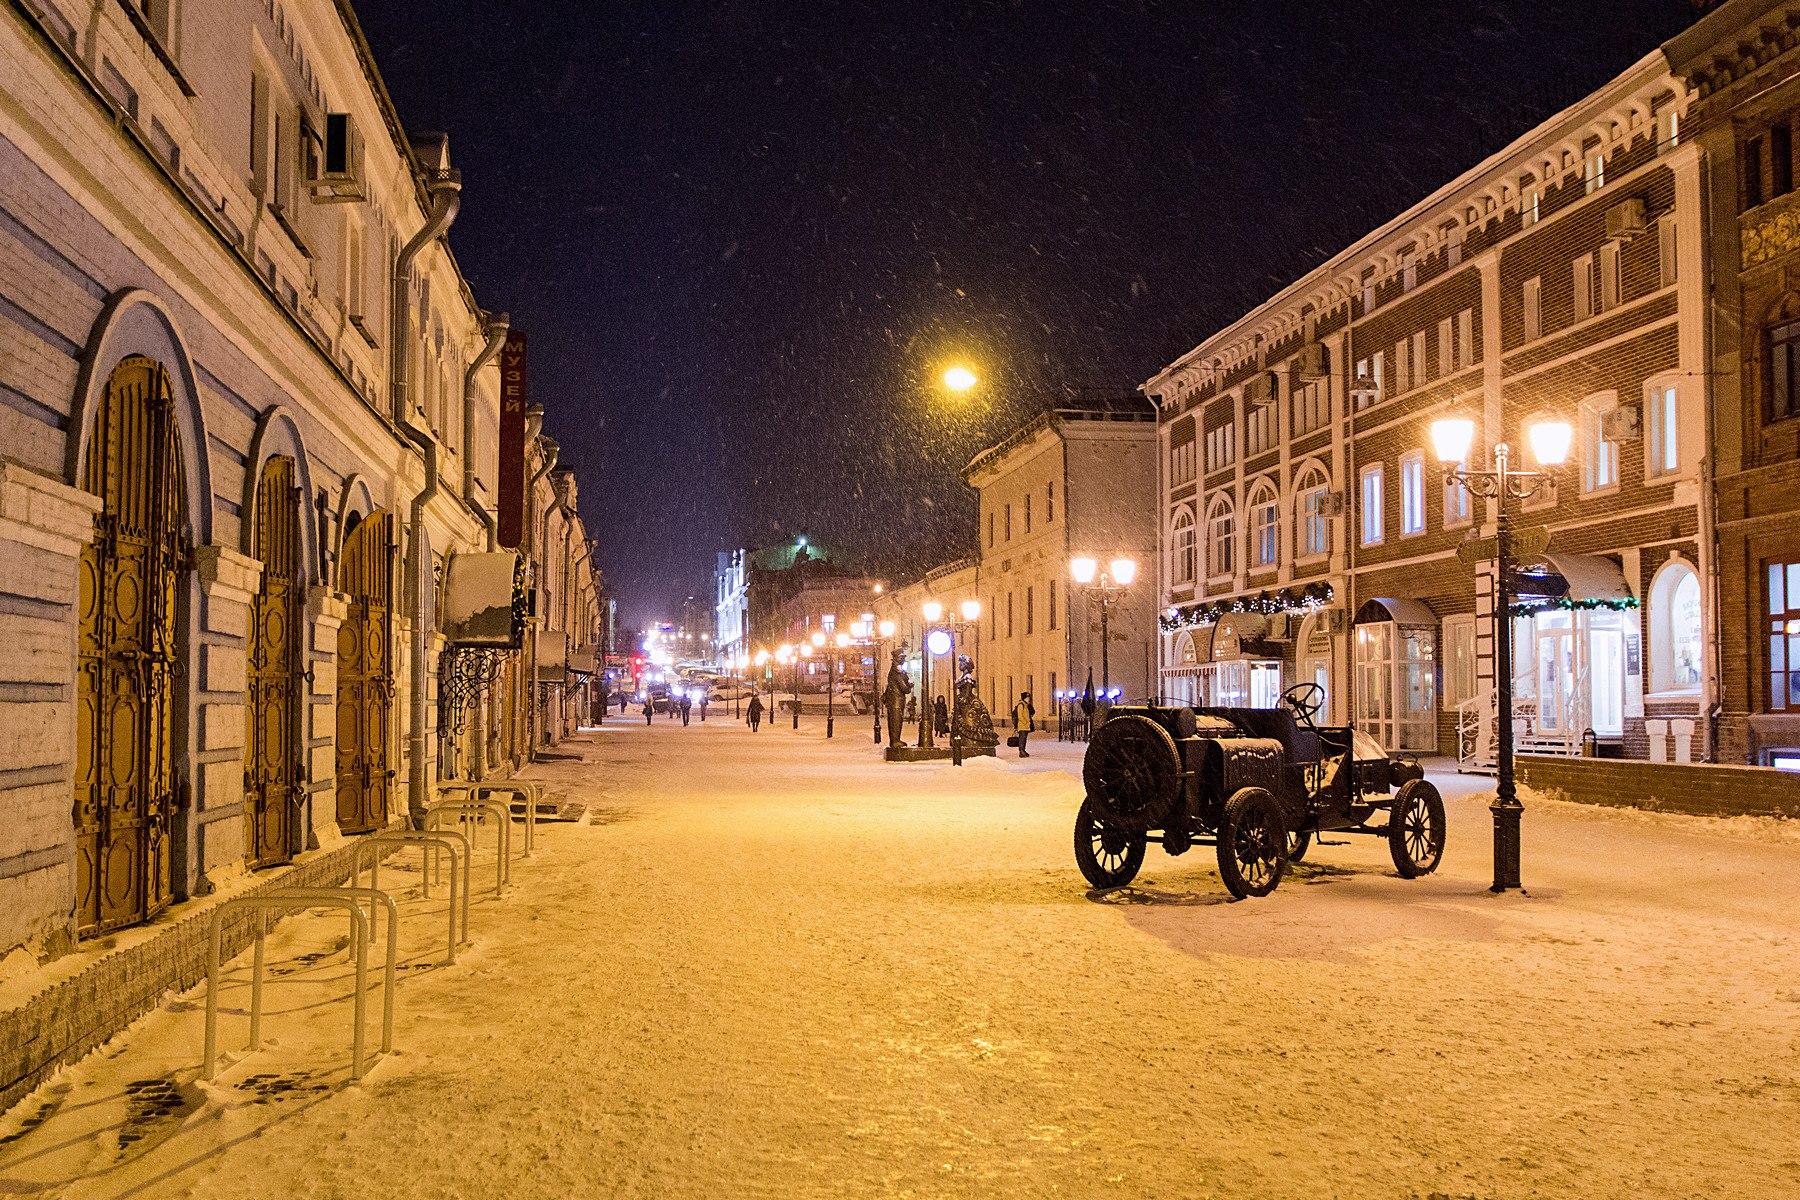 Hostel Dostoevsky Kirov - Old town